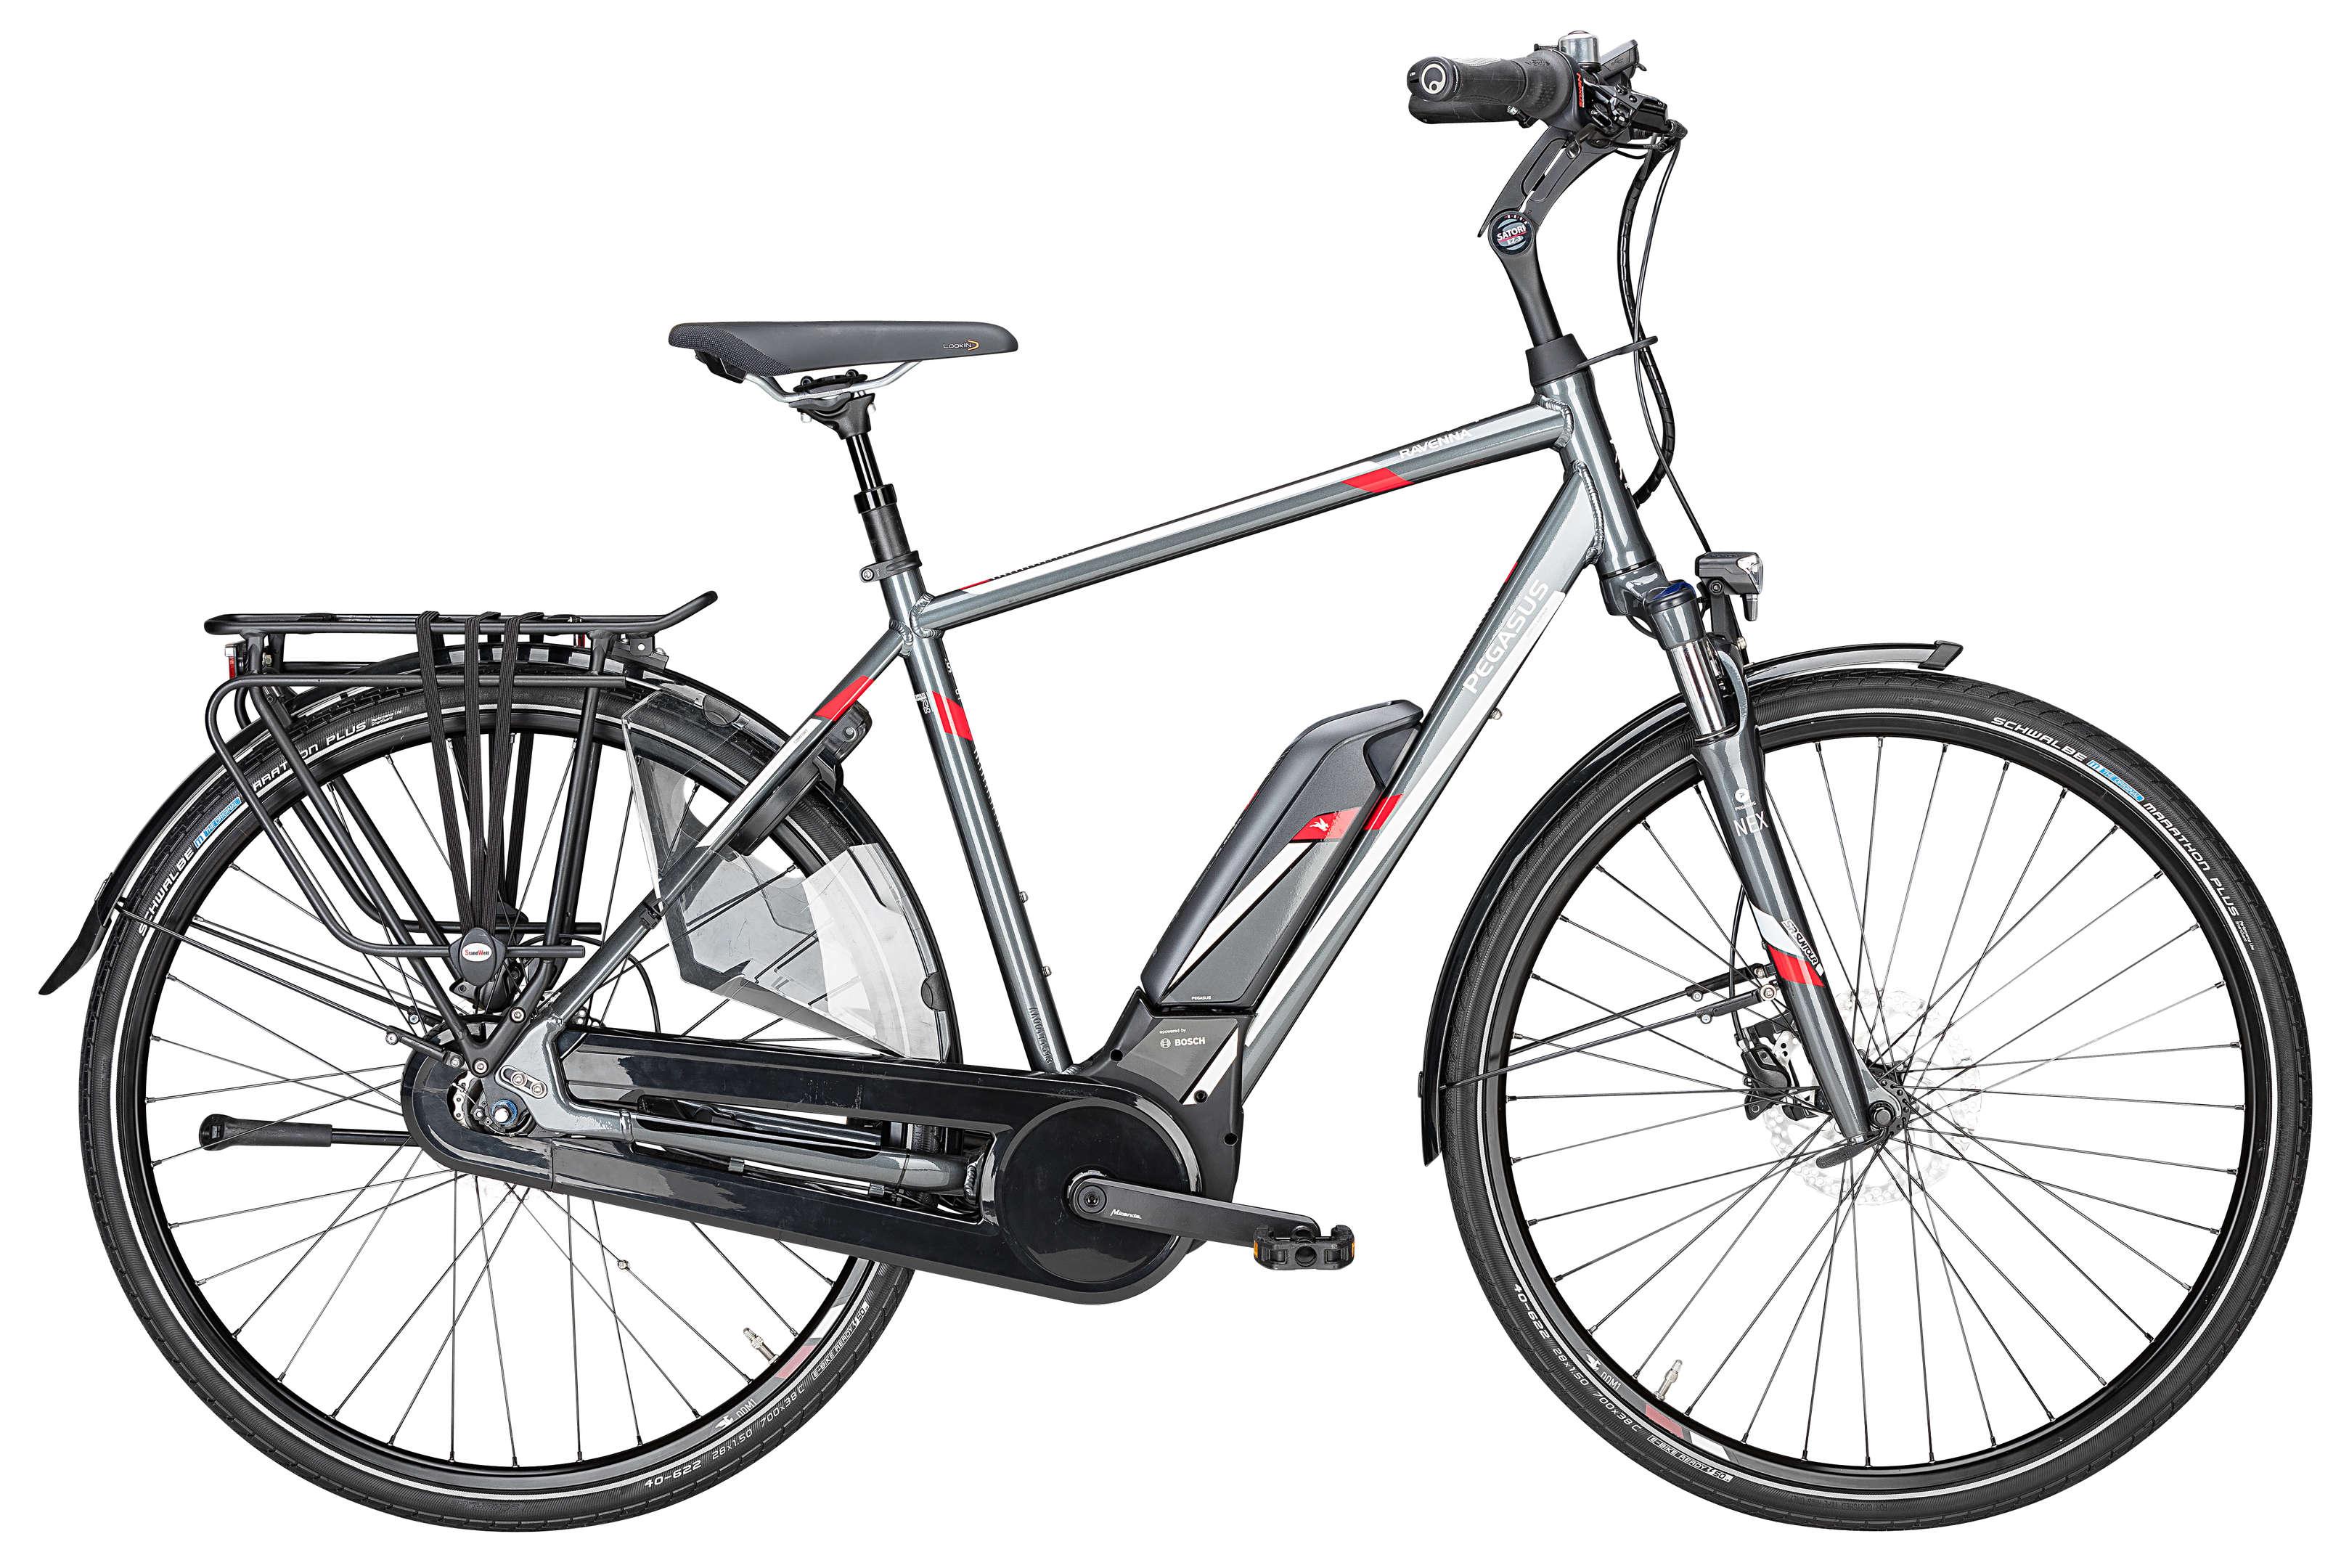 pegasus e bike ravenna 8f eurorad bikeleasingeurorad. Black Bedroom Furniture Sets. Home Design Ideas